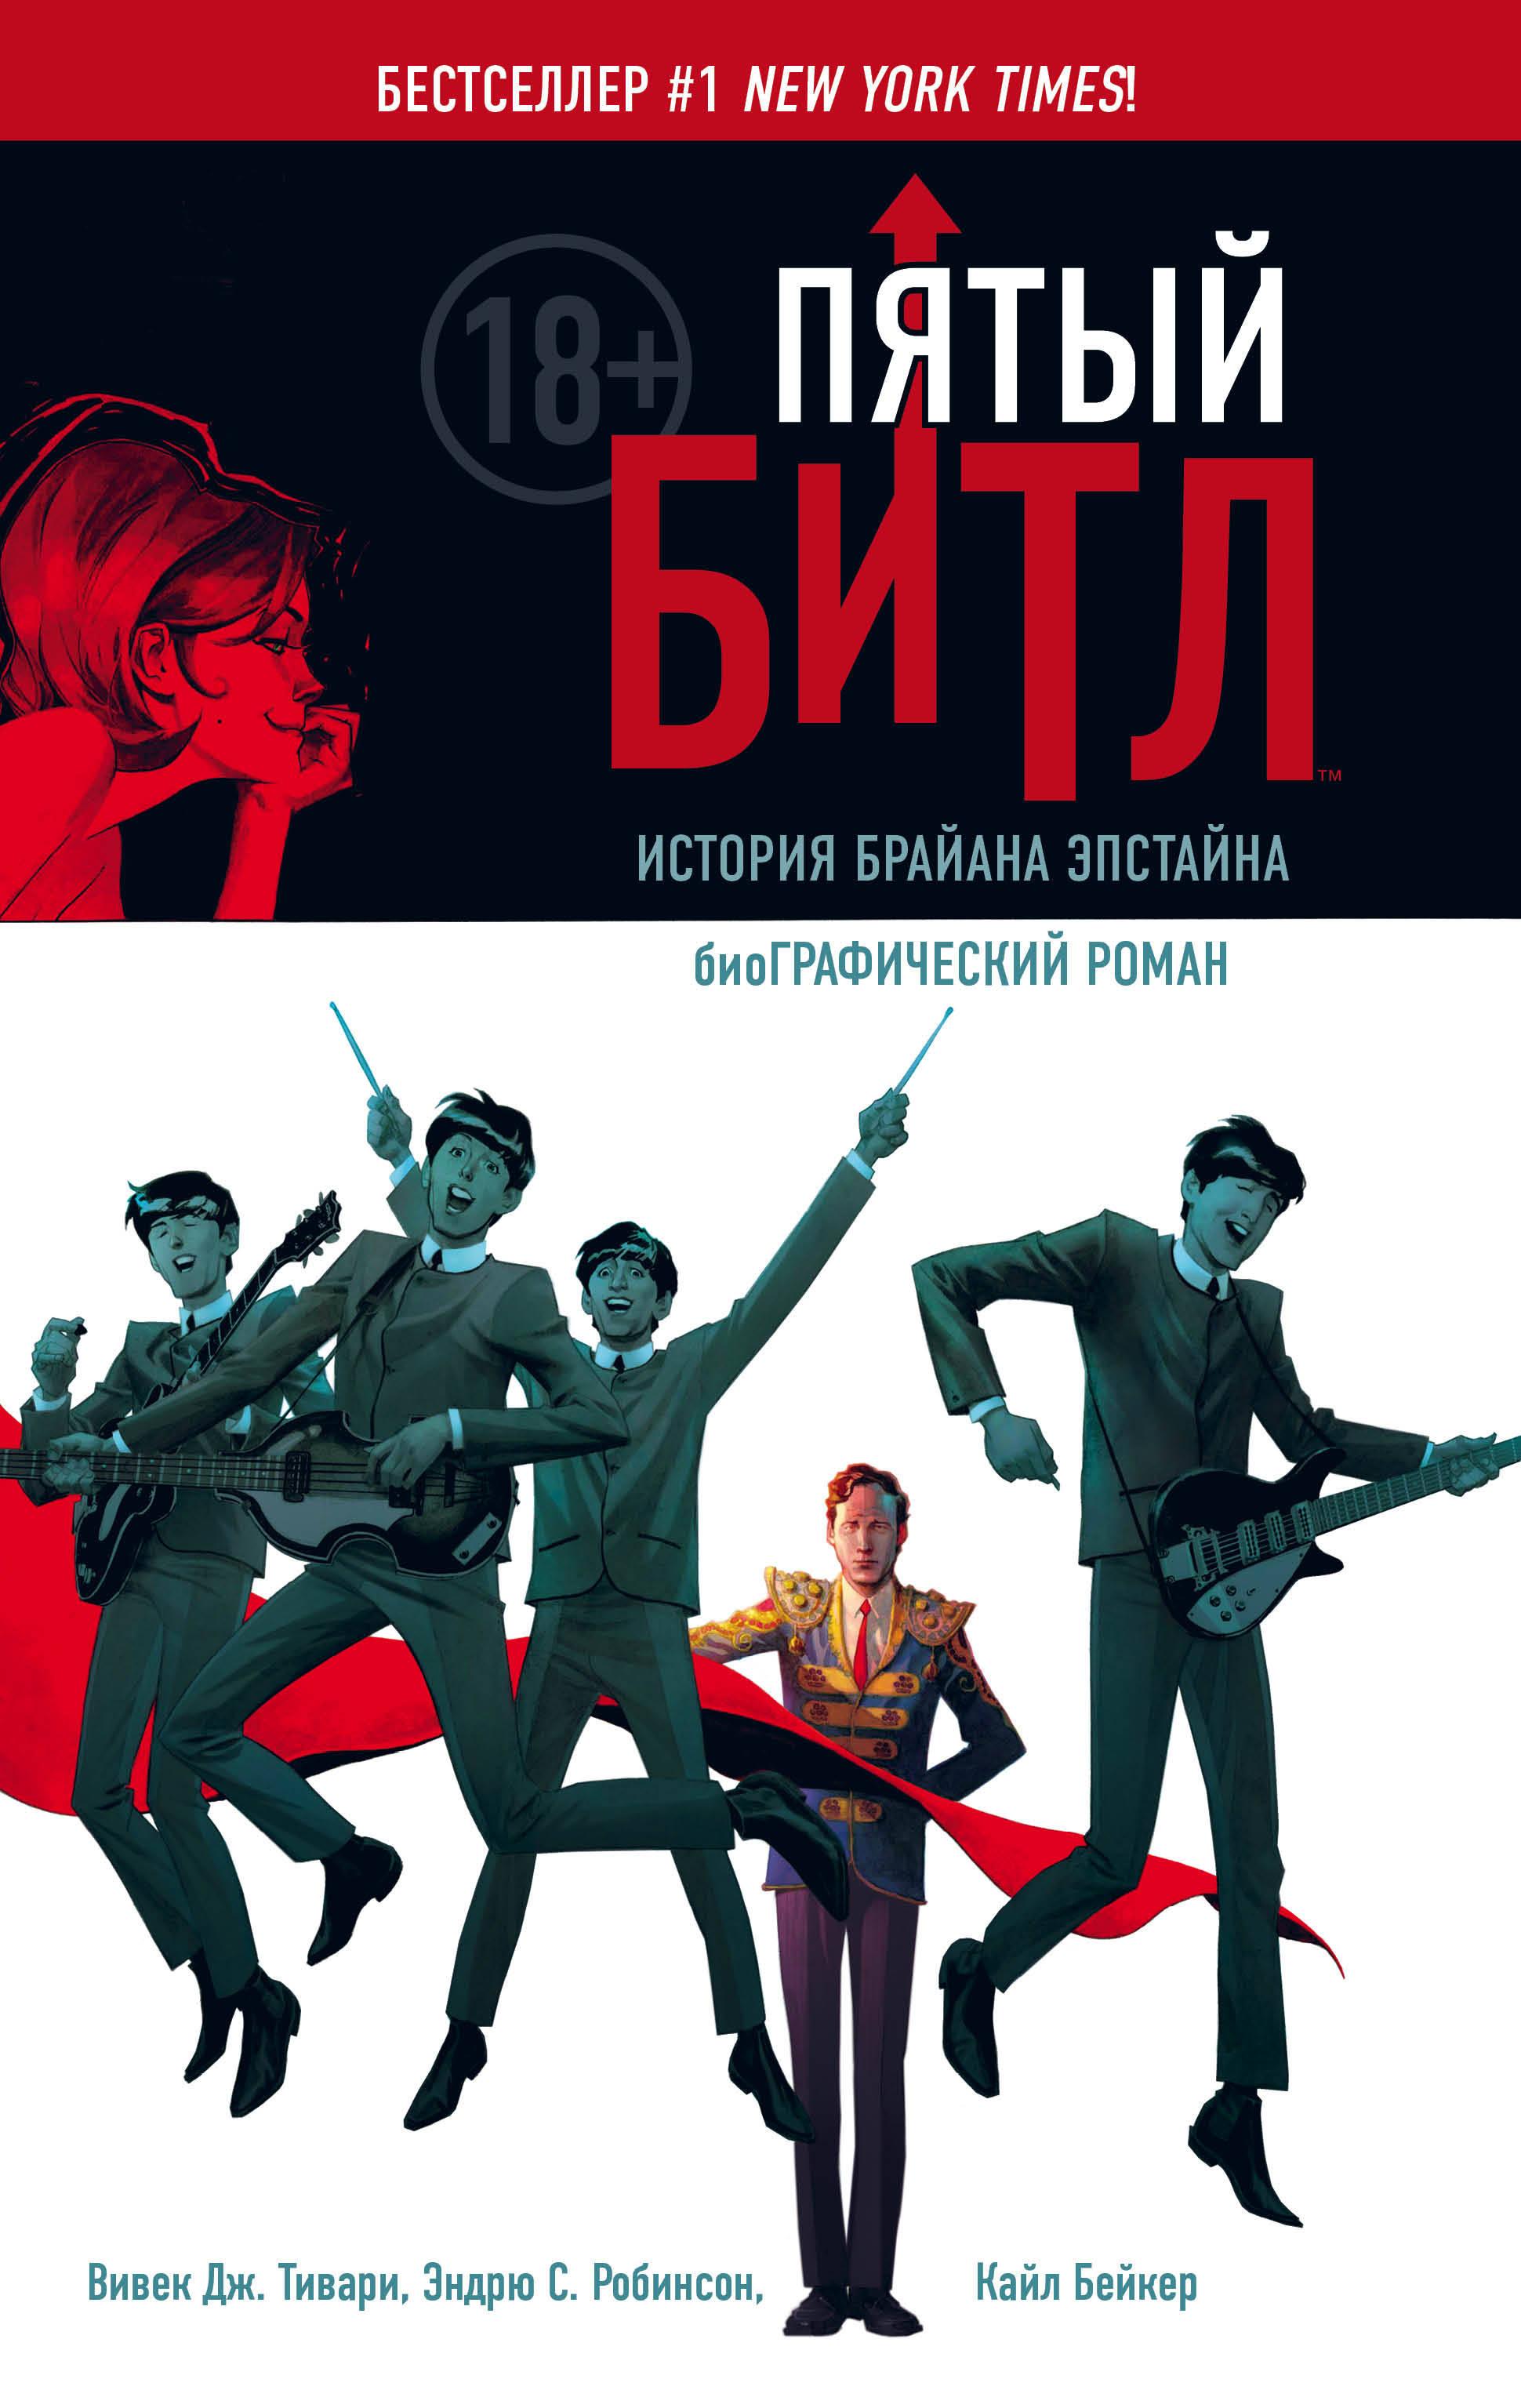 Вивек Дж. Тивари Пятый Битл. Графический роман ISBN: 978-5-04-094353-1